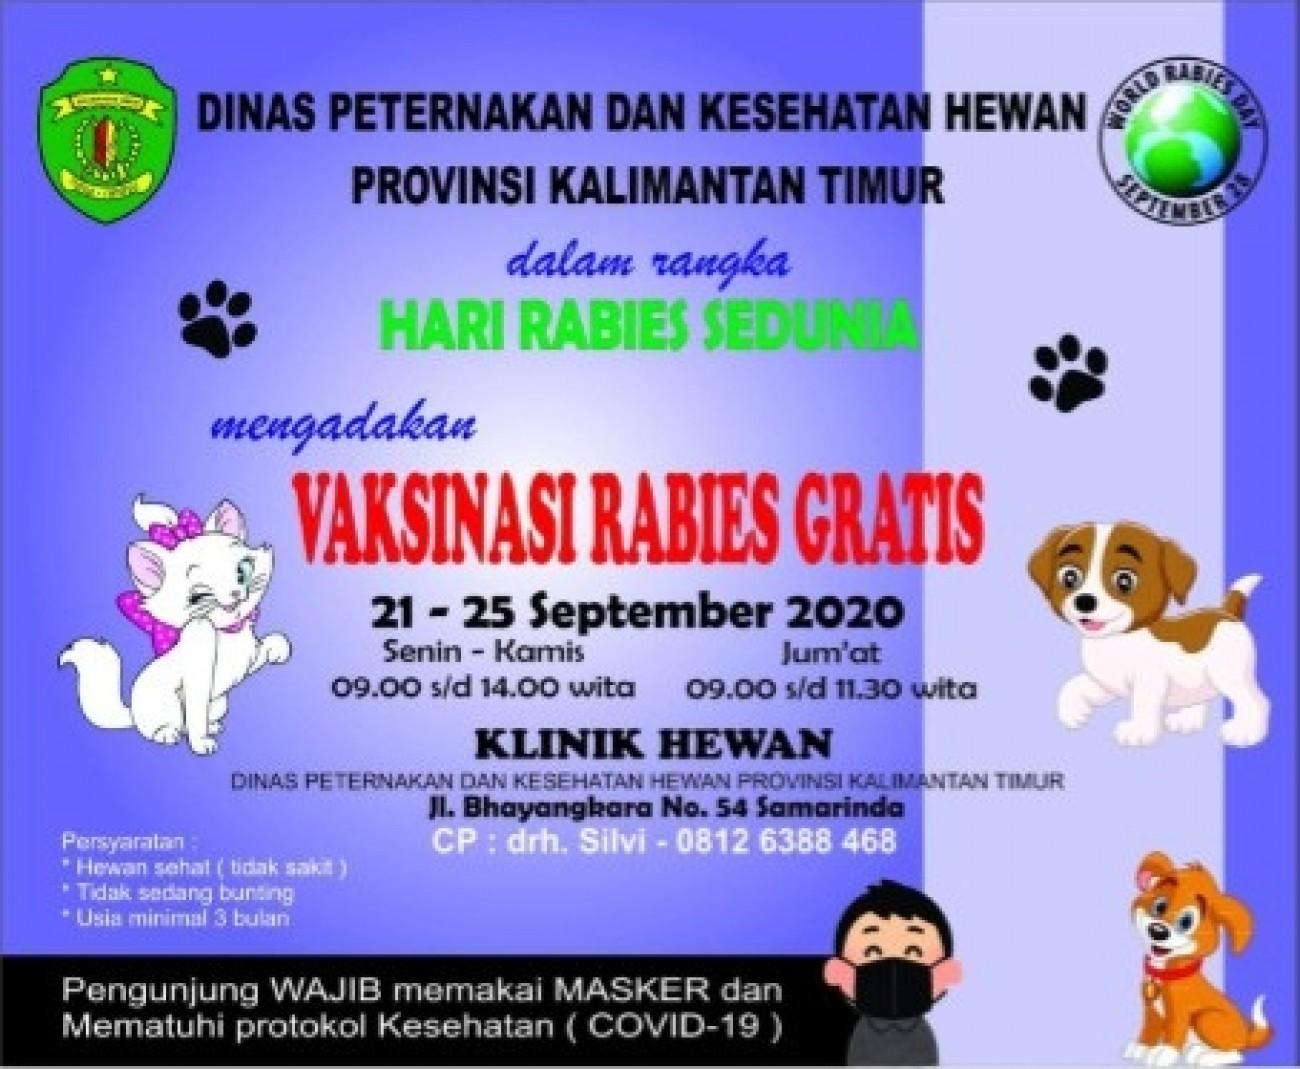 Menyongsong Hari Rabies Sedunia, Dinas Peternakan Adakan Vaksinasi Hewan Gratis